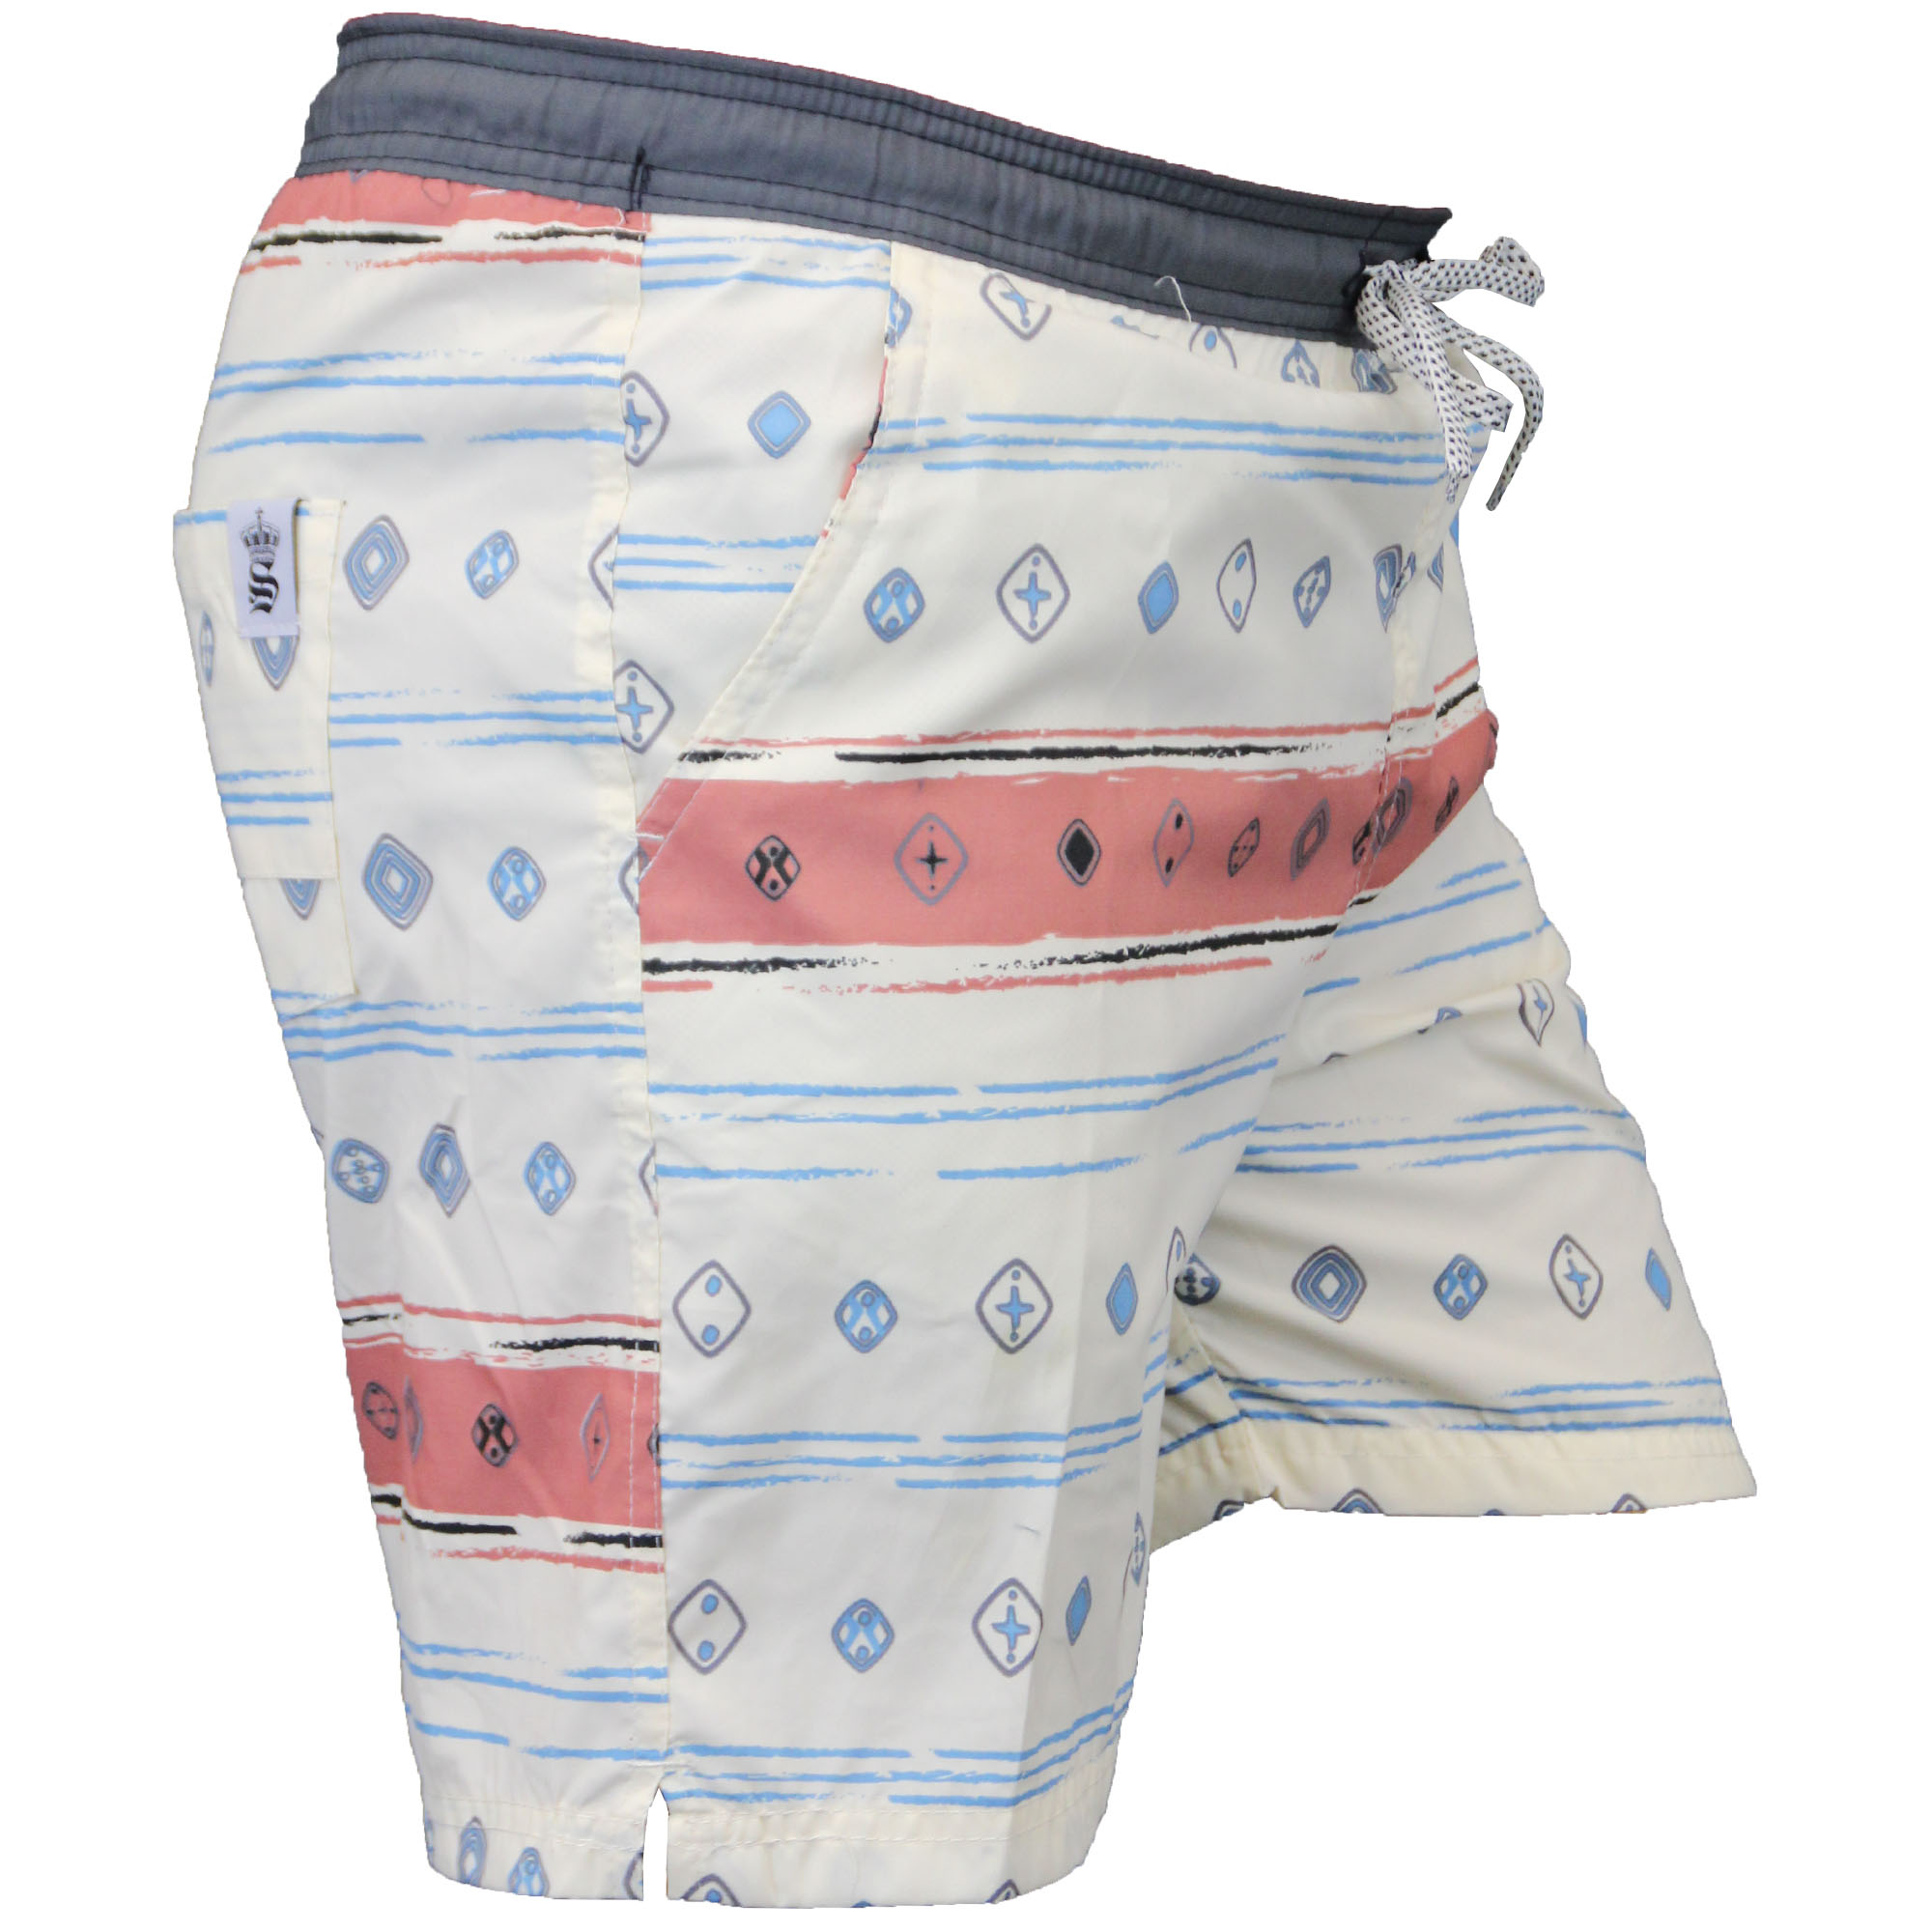 Mens Swimming Shorts Soul Star Aztec Print Trunks Beach Mesh Summer Casual New